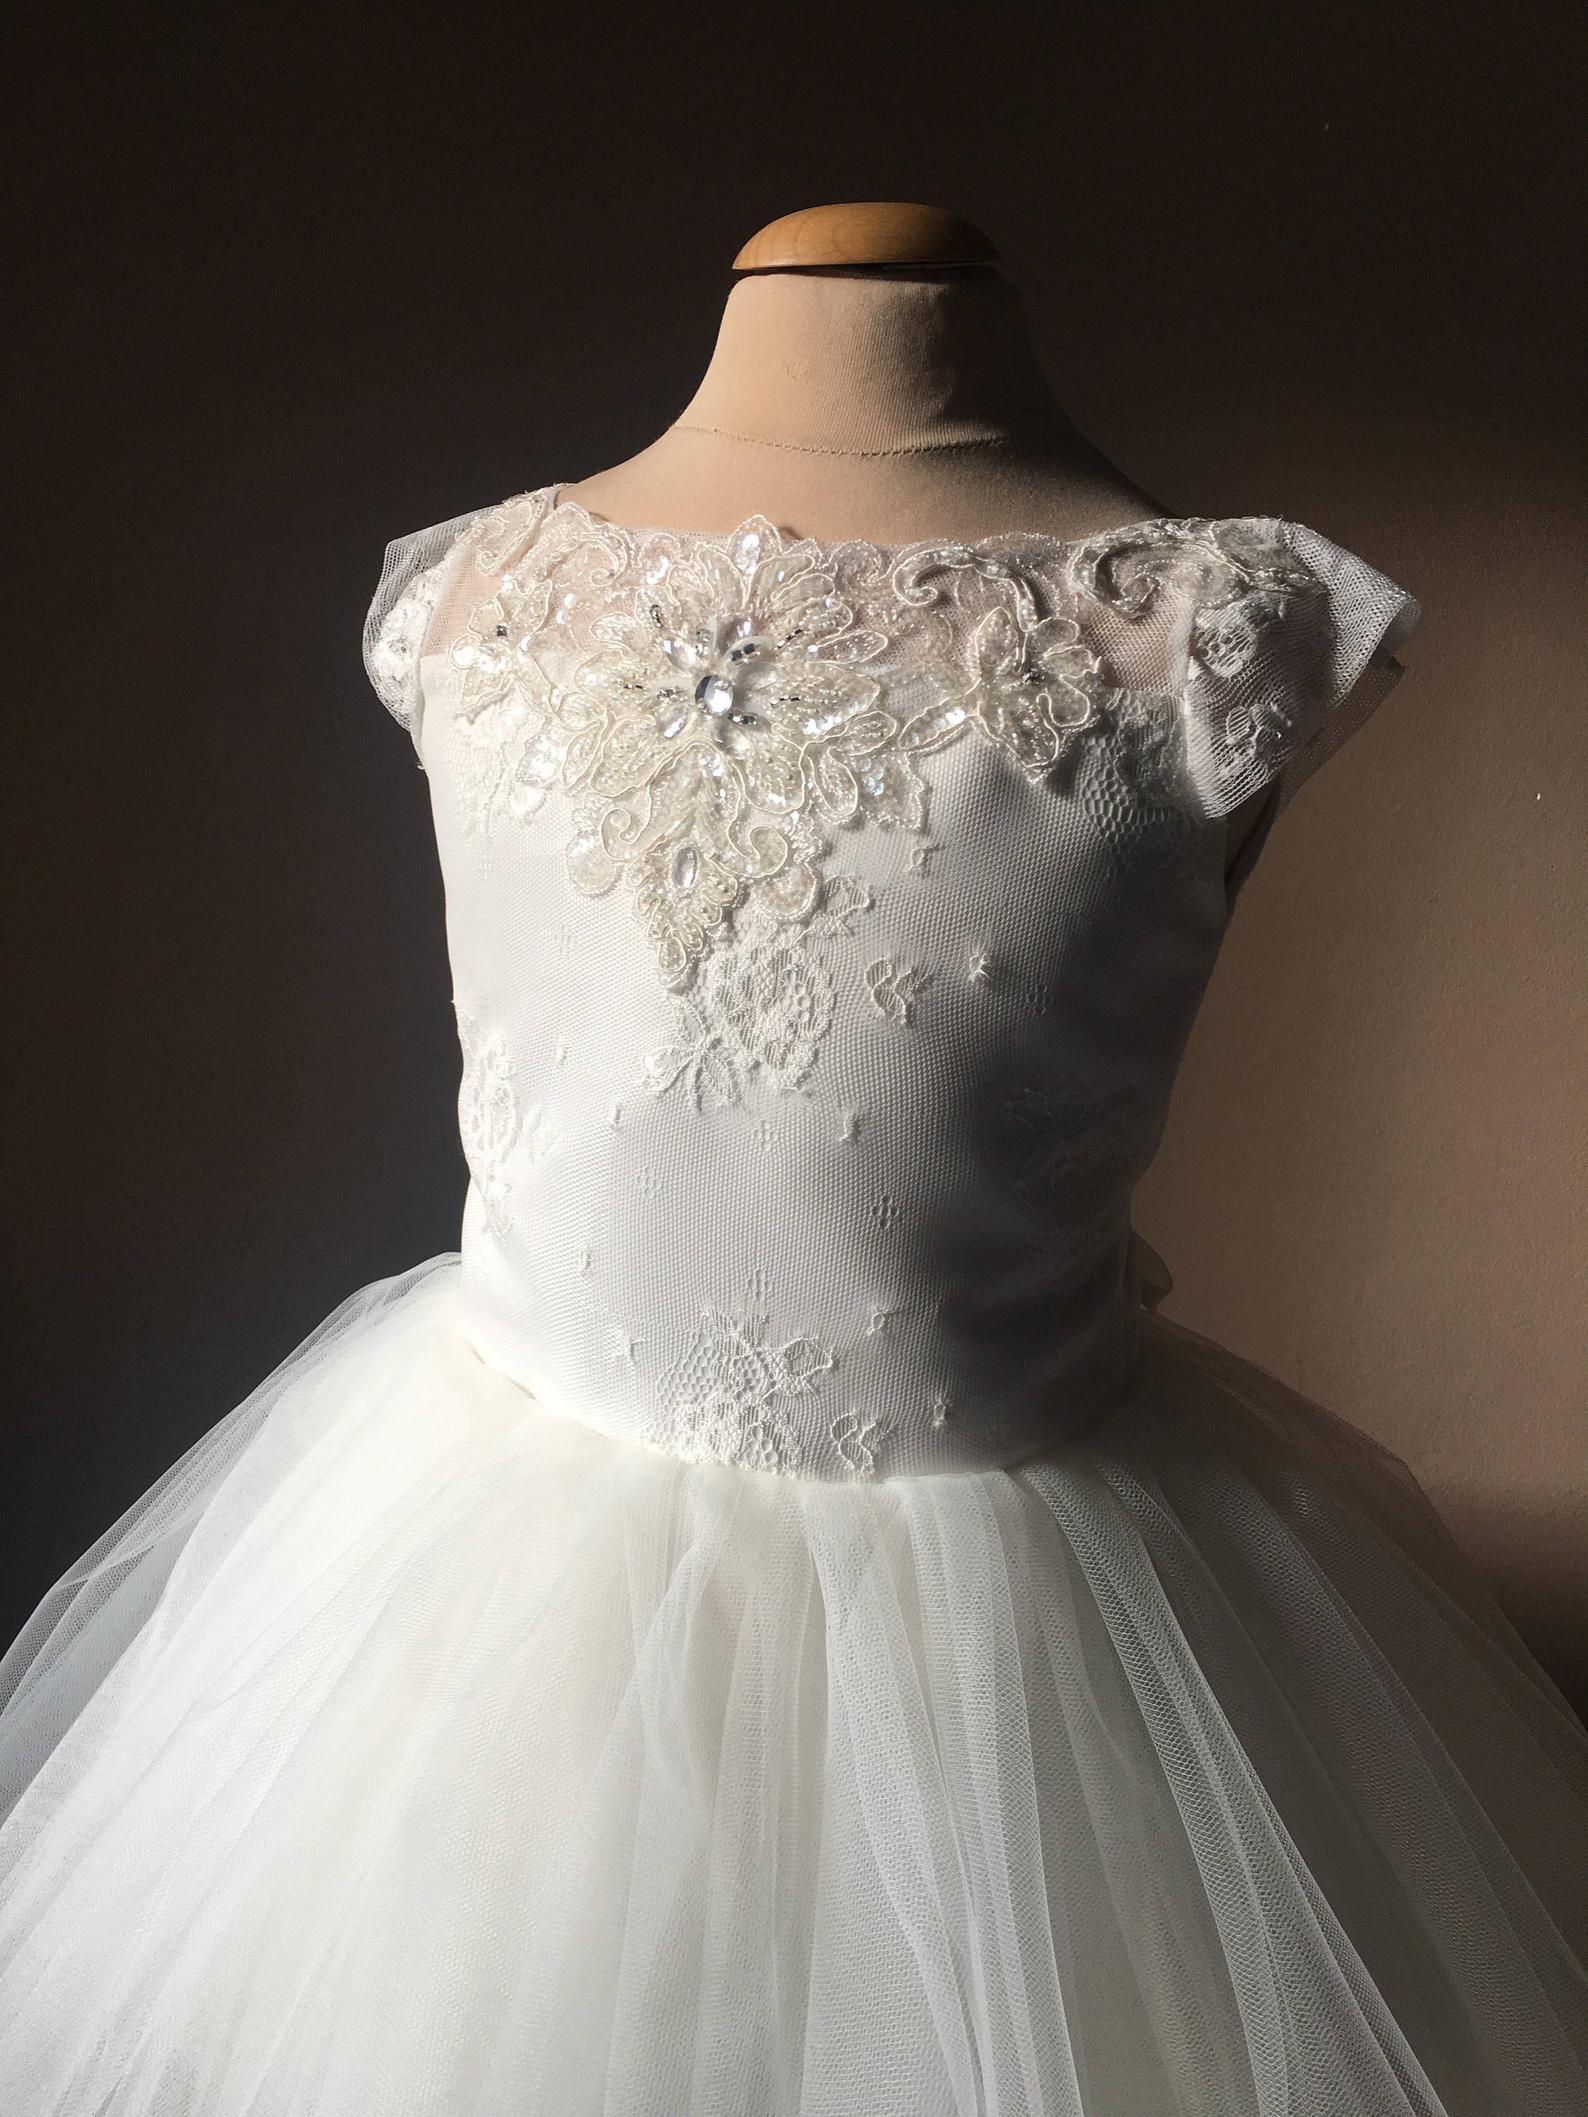 SHARON Ivory Lace Tulle Flower Girl Dress Vintage Dress ... Ivory Lace Vintage Flower Girl Dress